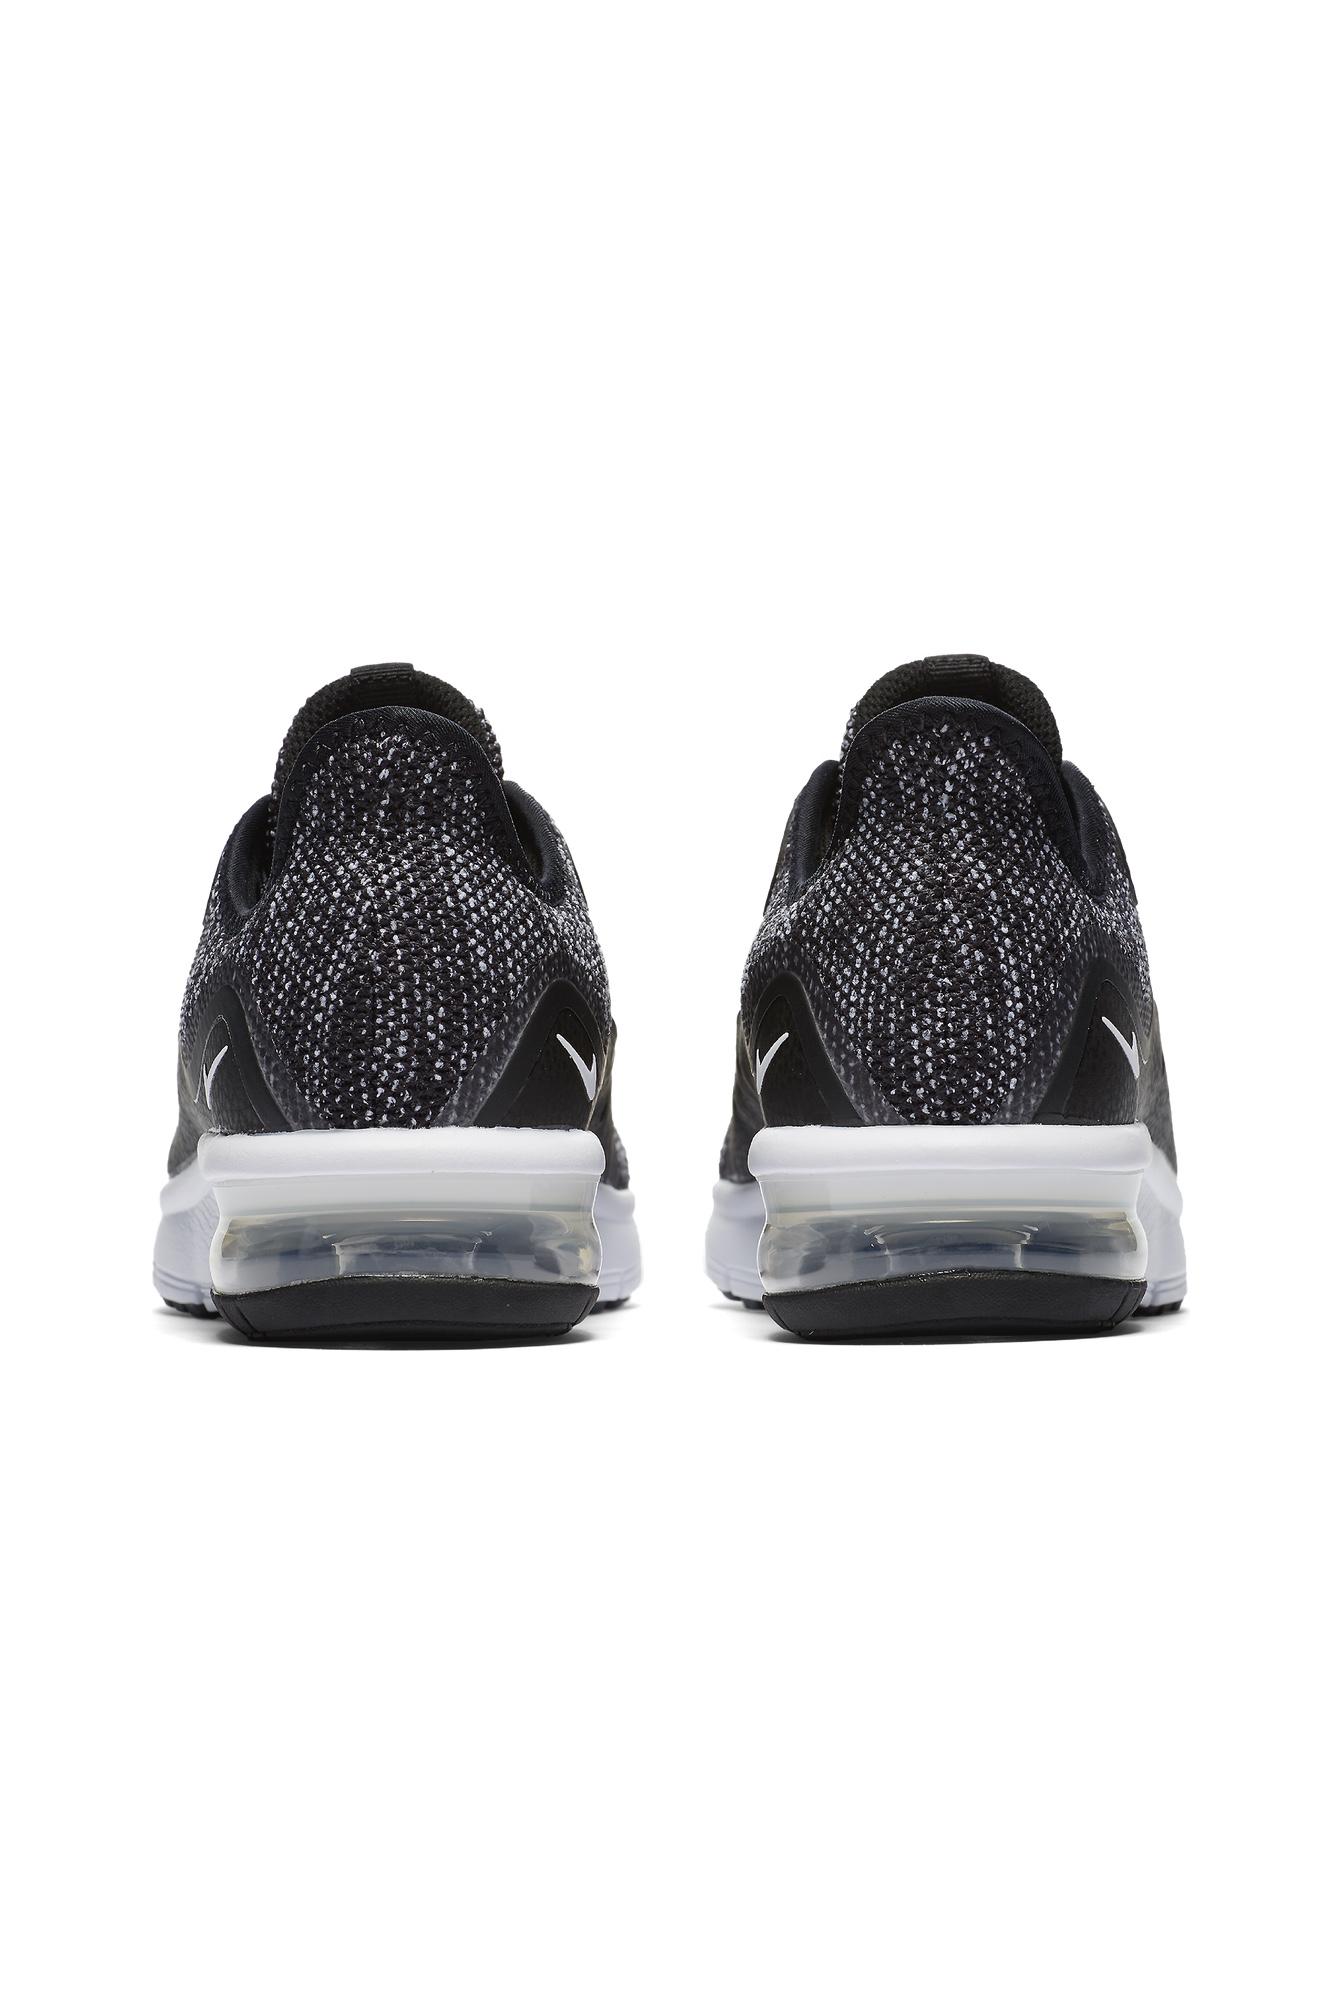 Buty Nike Air Max Sequent 3 (GS) - 922884-001   Do biegania   Buty ... aee6fe6120b